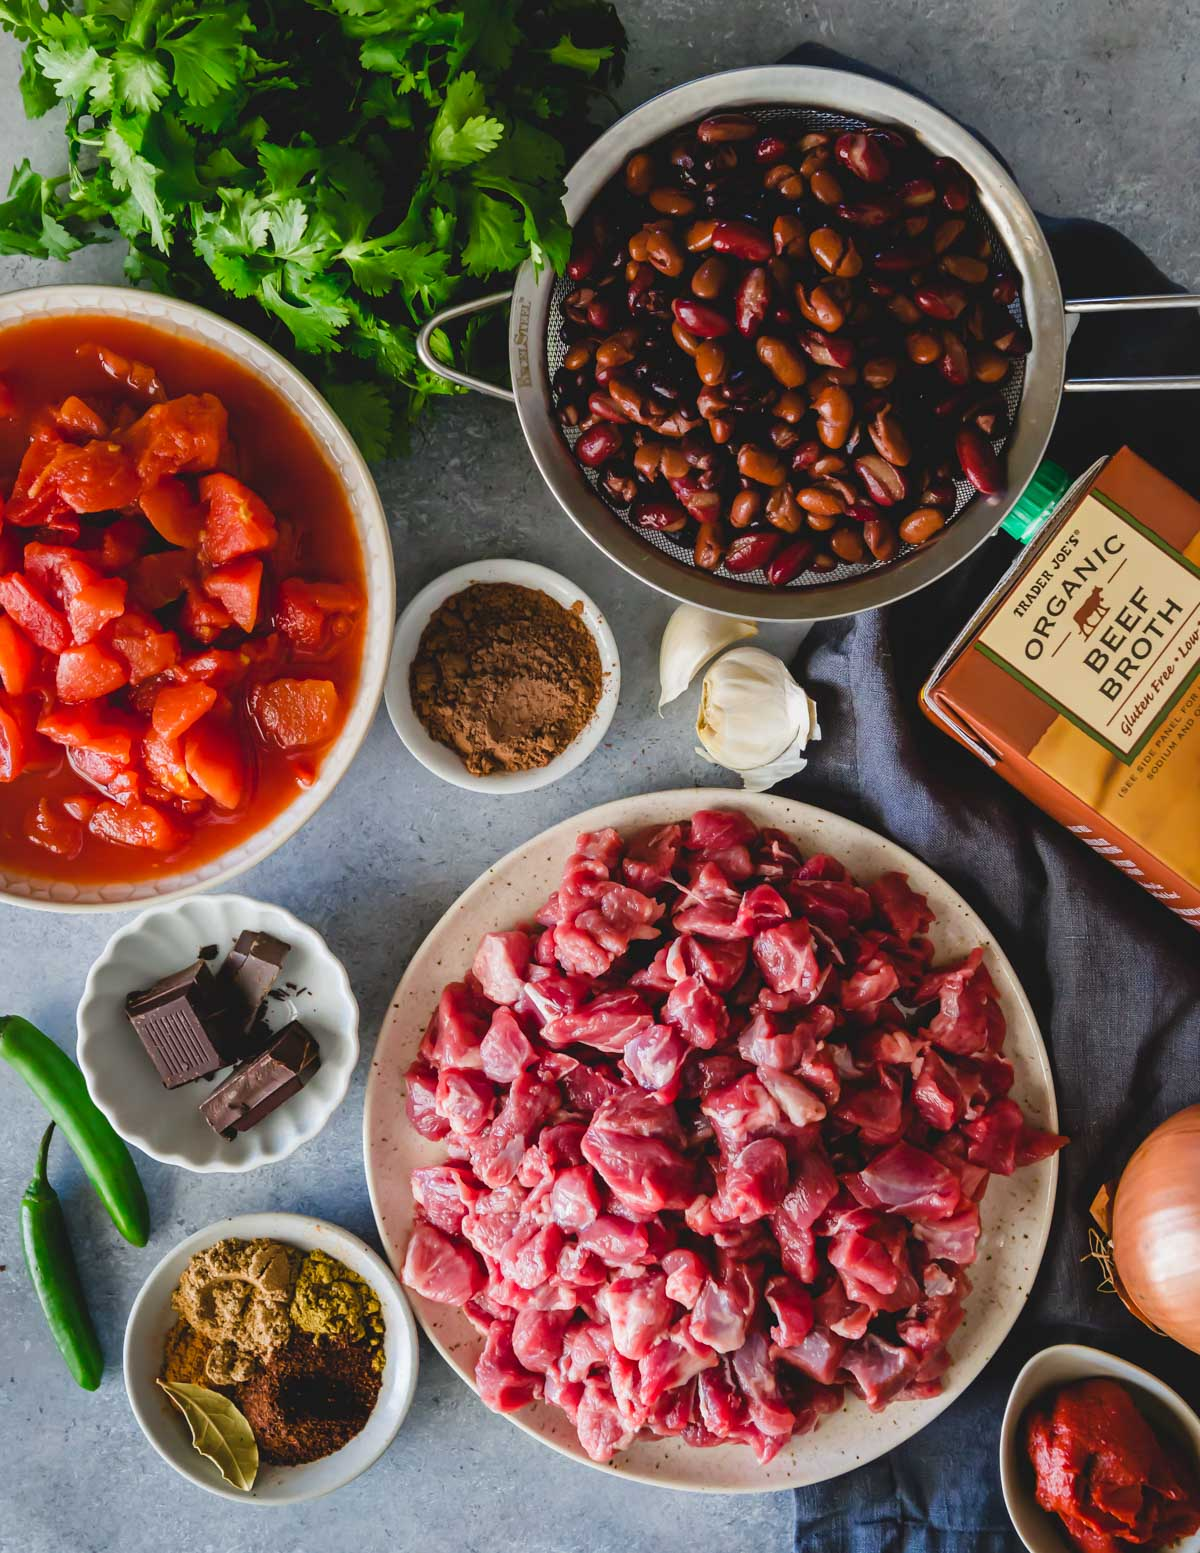 Ingredients to make chocolate lamb chili recipe.